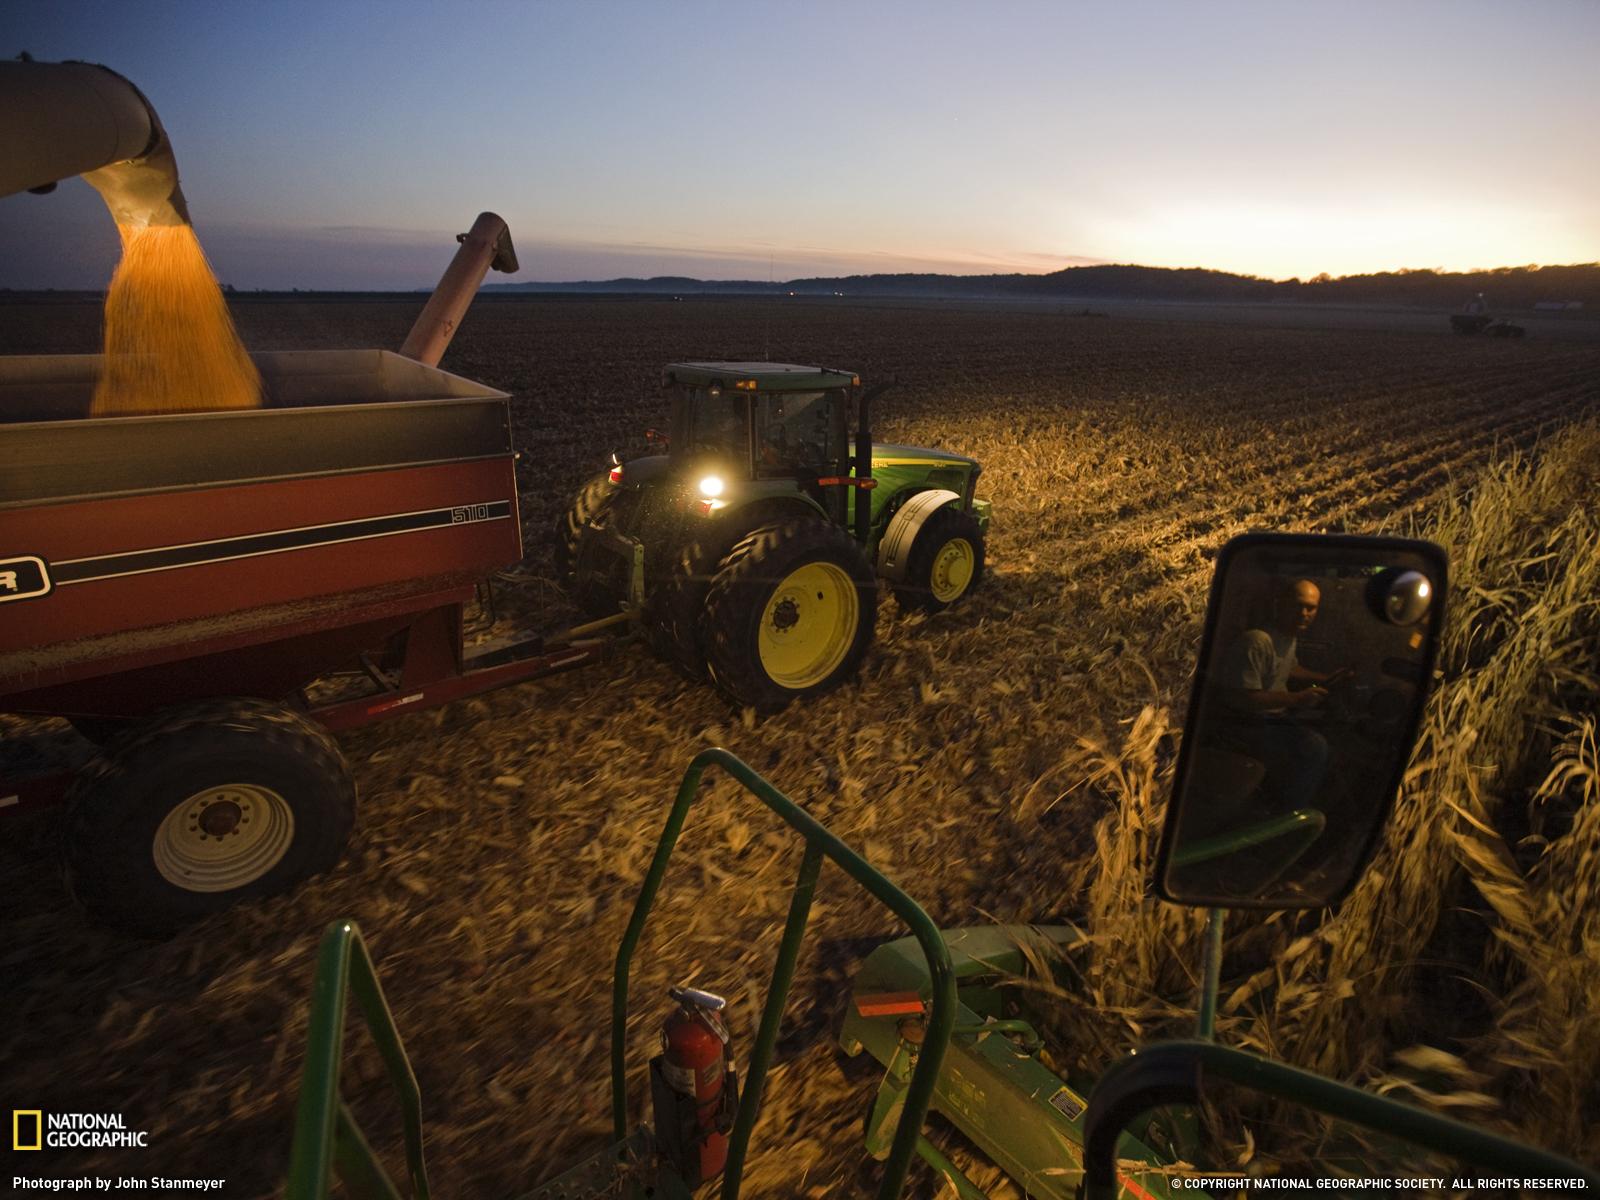 Top Beautiful Farming Photos 19 HD Widescreen BSCB Wallpapers 1600x1200